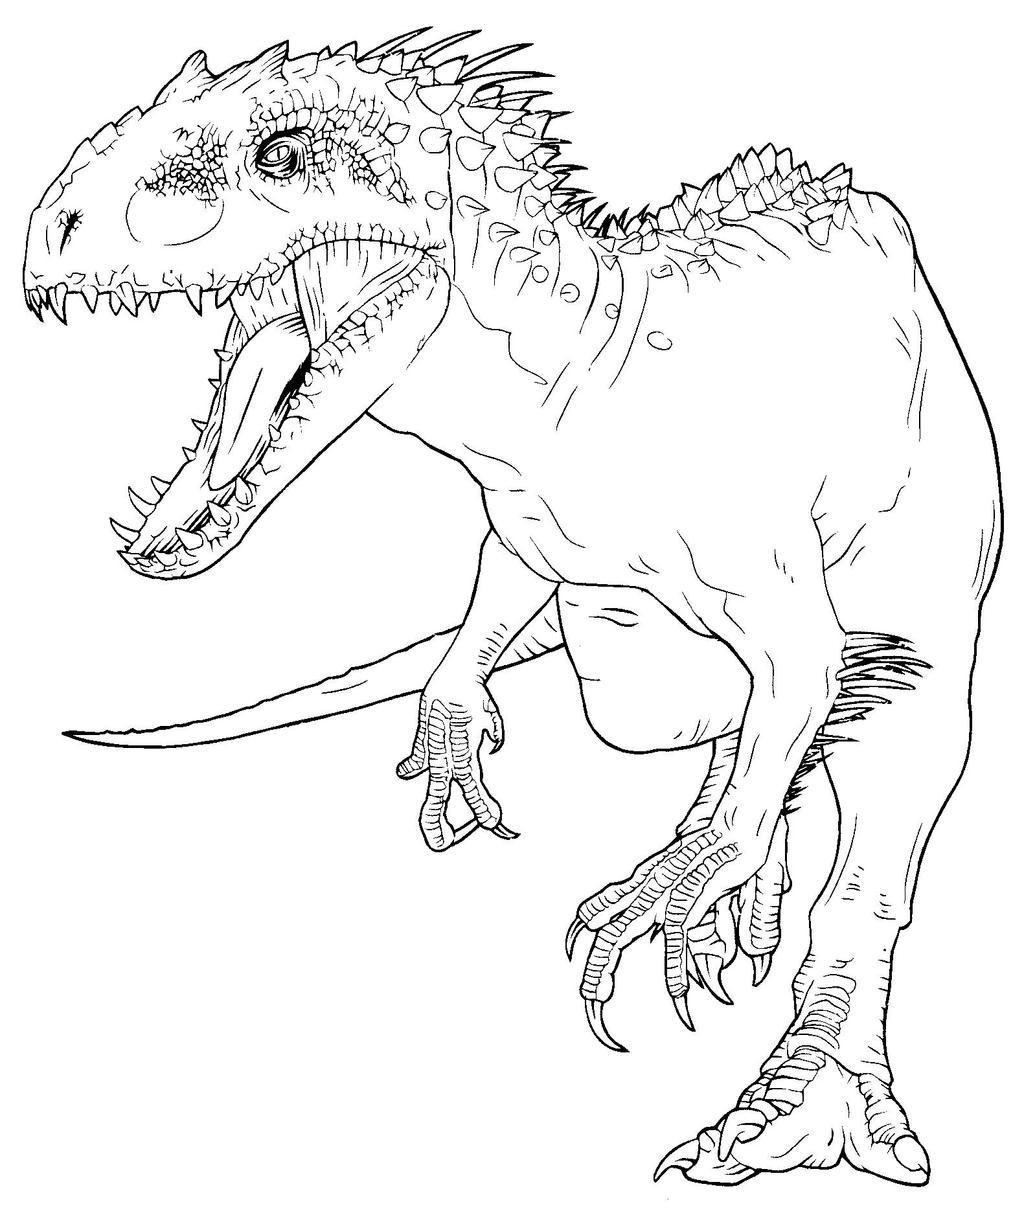 JW color book Indominus Rex 3 by indominus-rex15 on DeviantArt